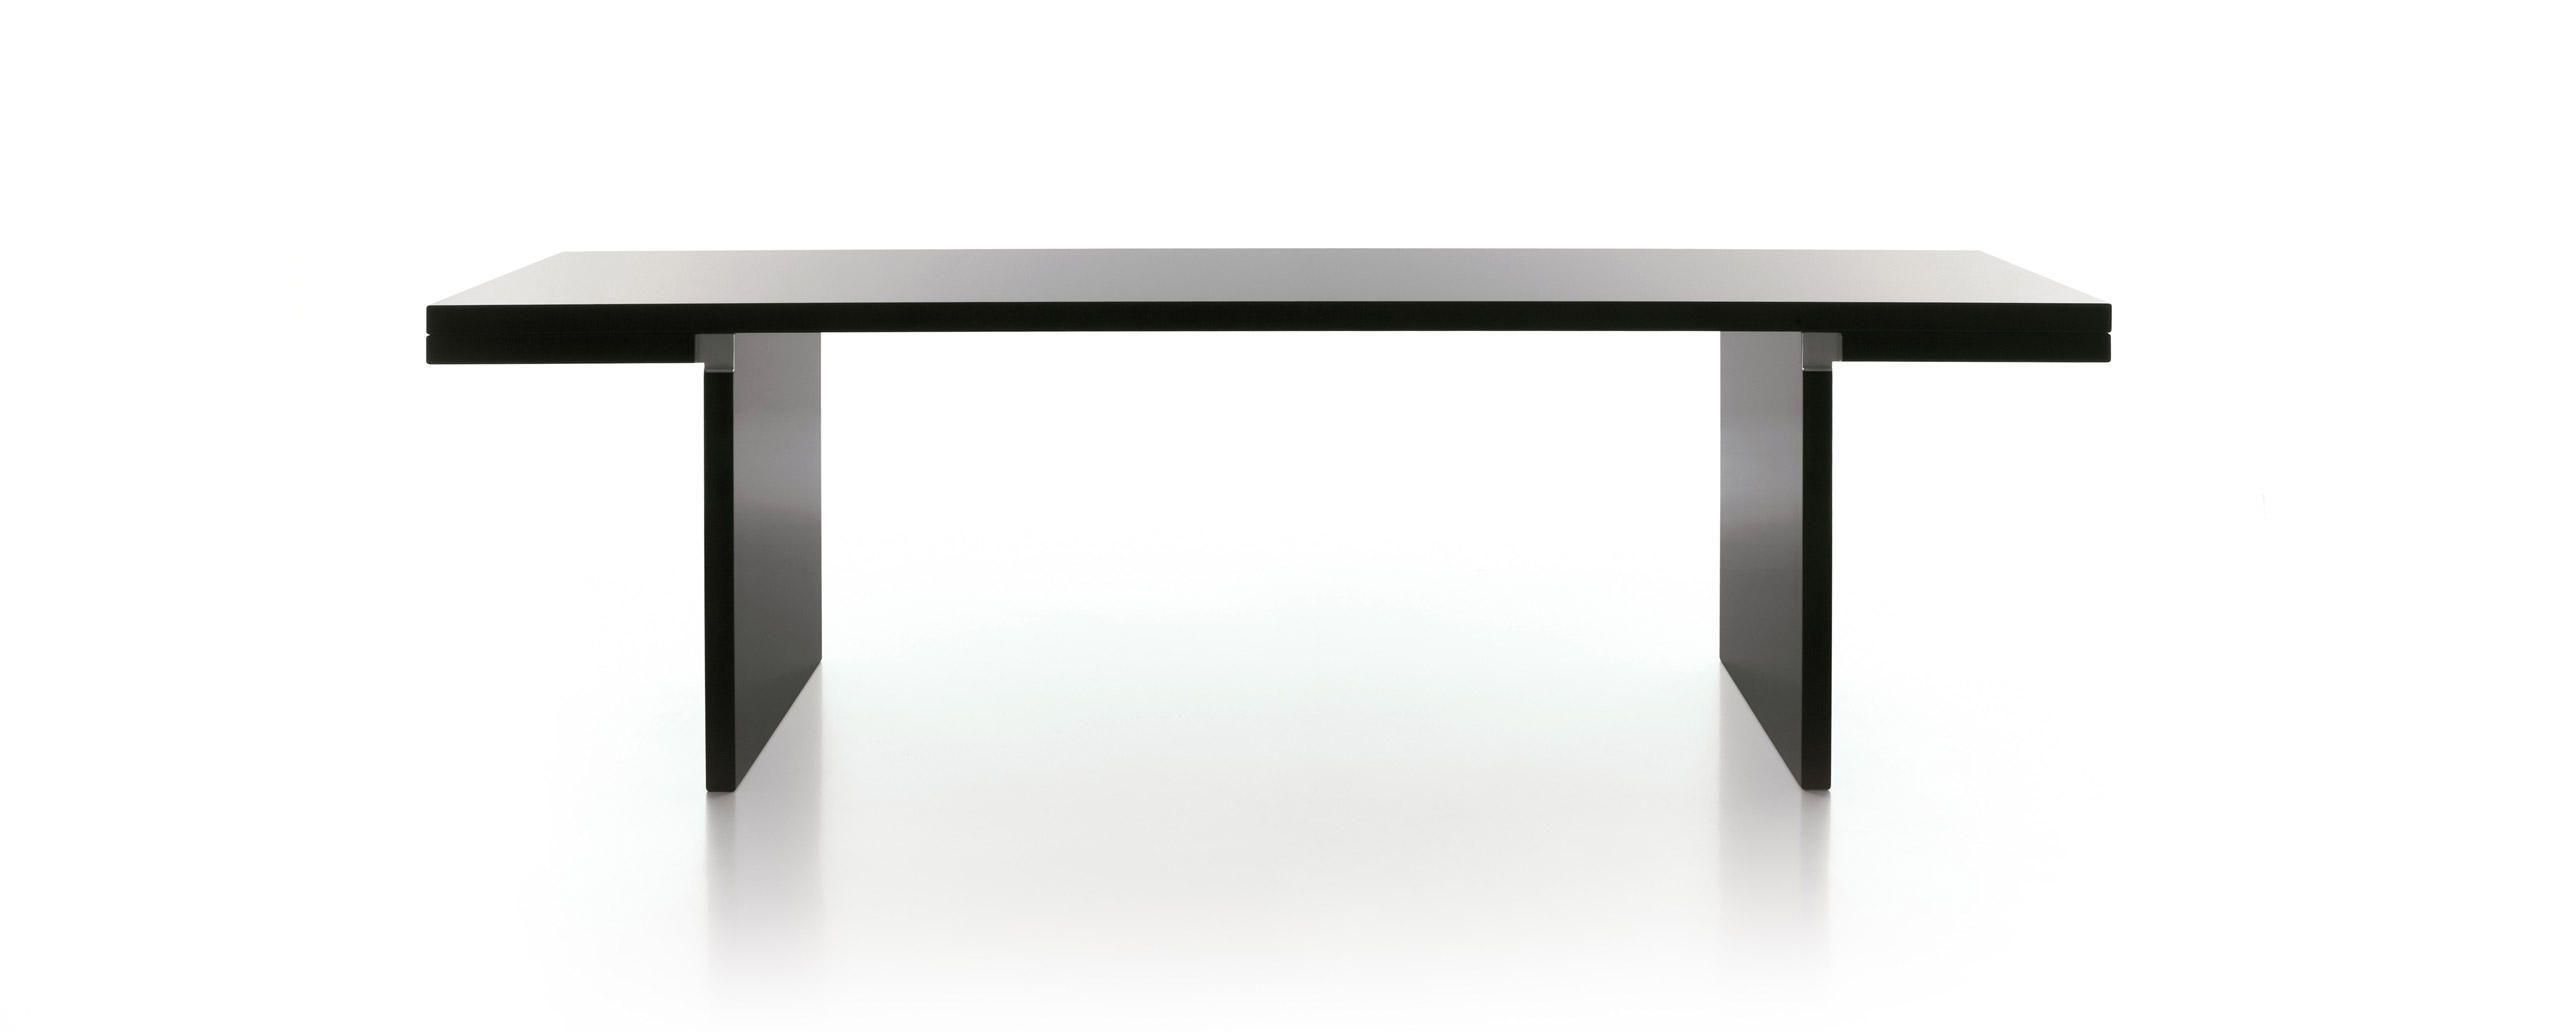 b6a702ea8377ca326f85ae5703f83a08 Incroyable De Table Basse Le Corbusier Concept